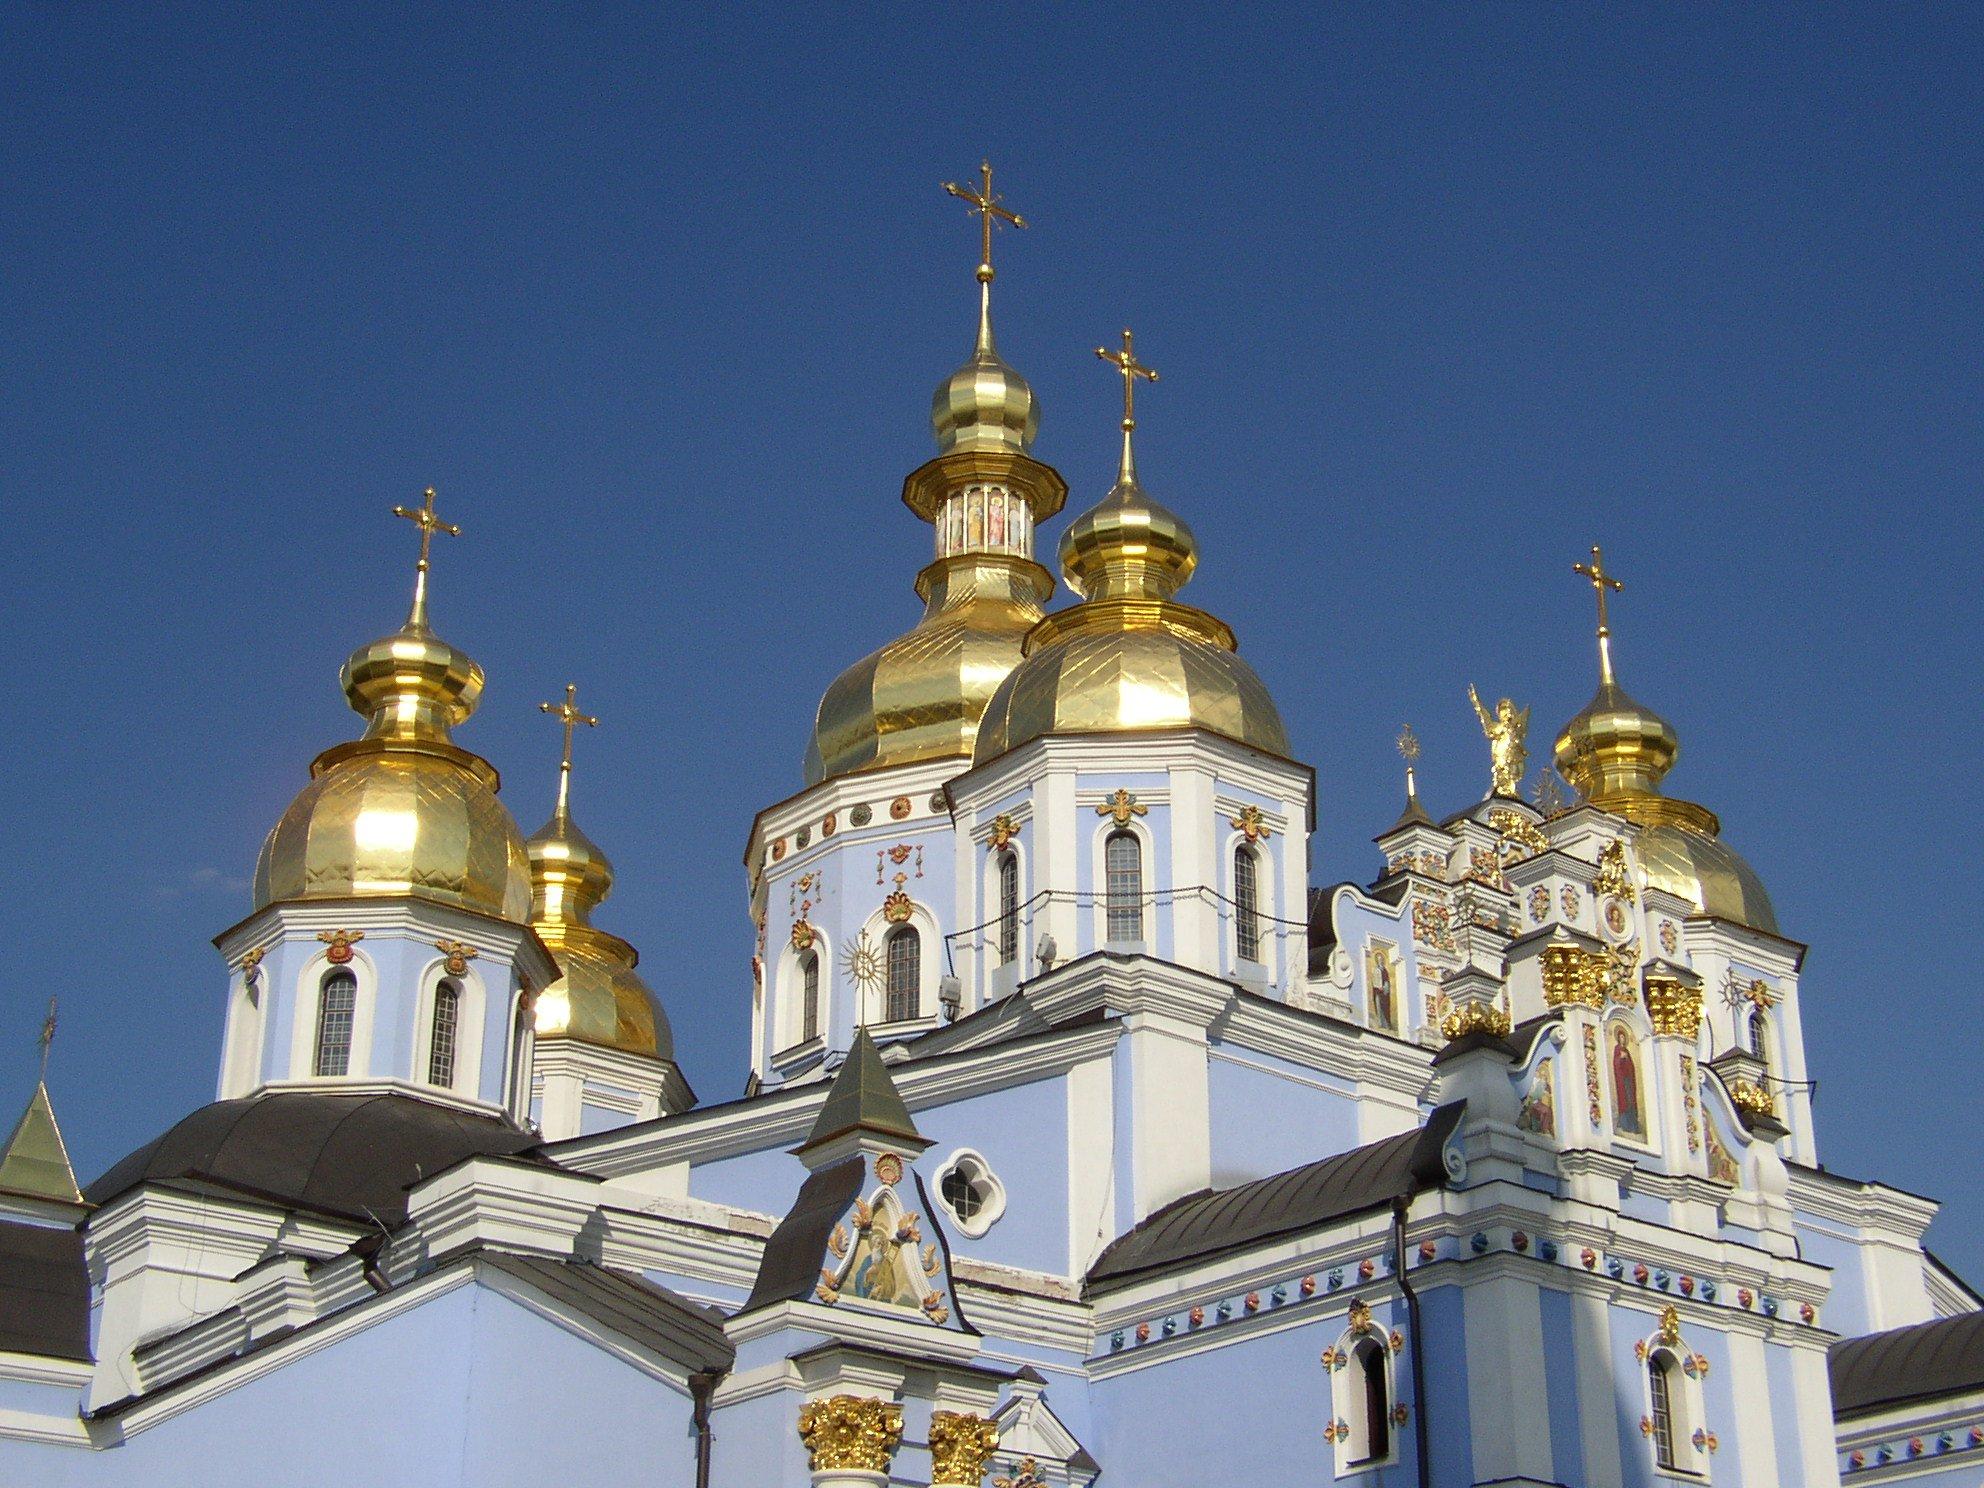 Kiew_Städtereise_4 Tage